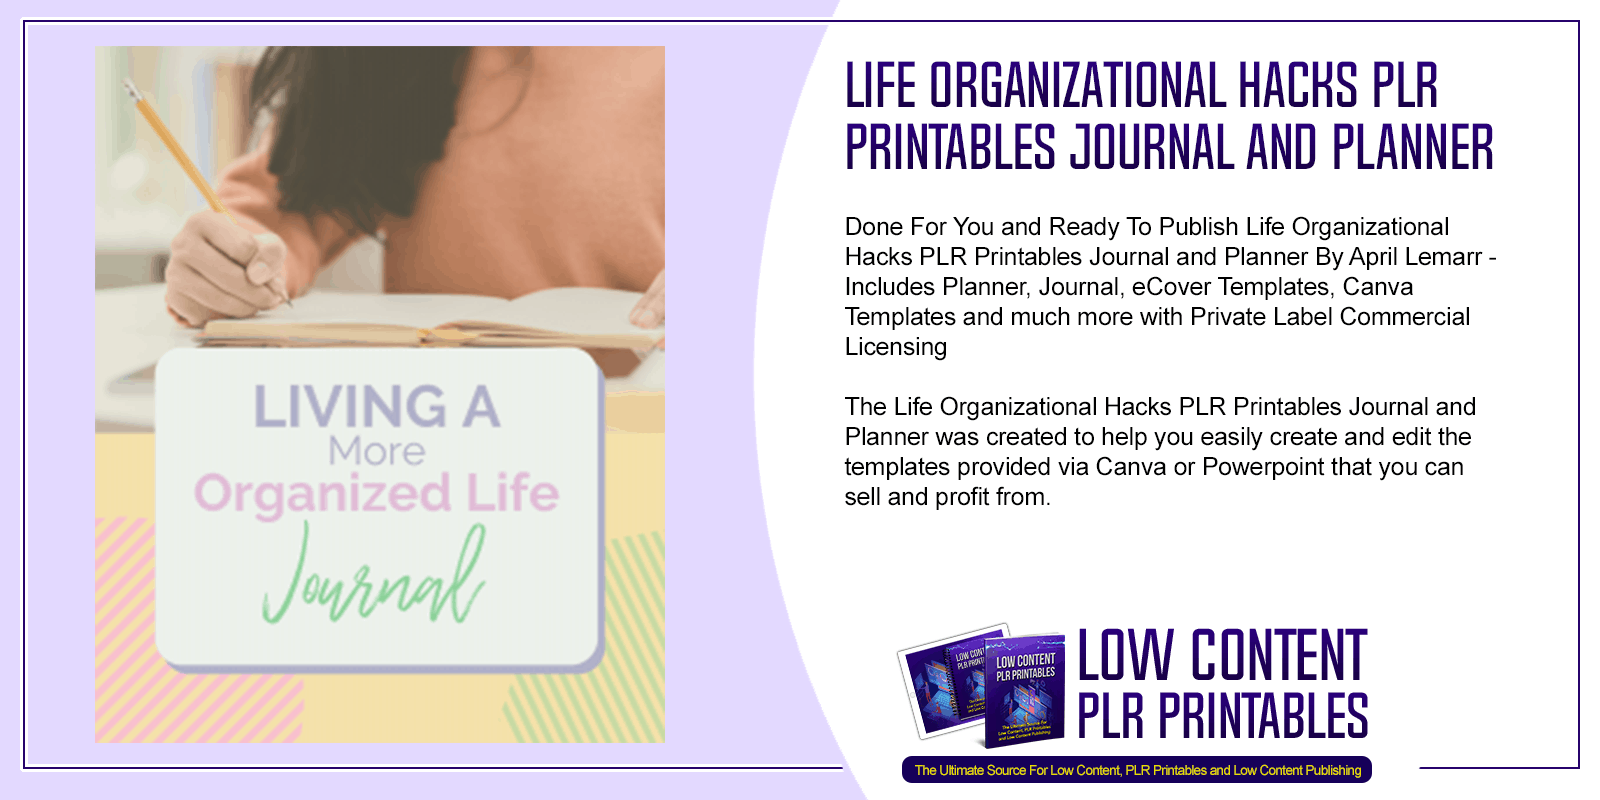 Life Organizational Hacks PLR Printables Journal and Planner